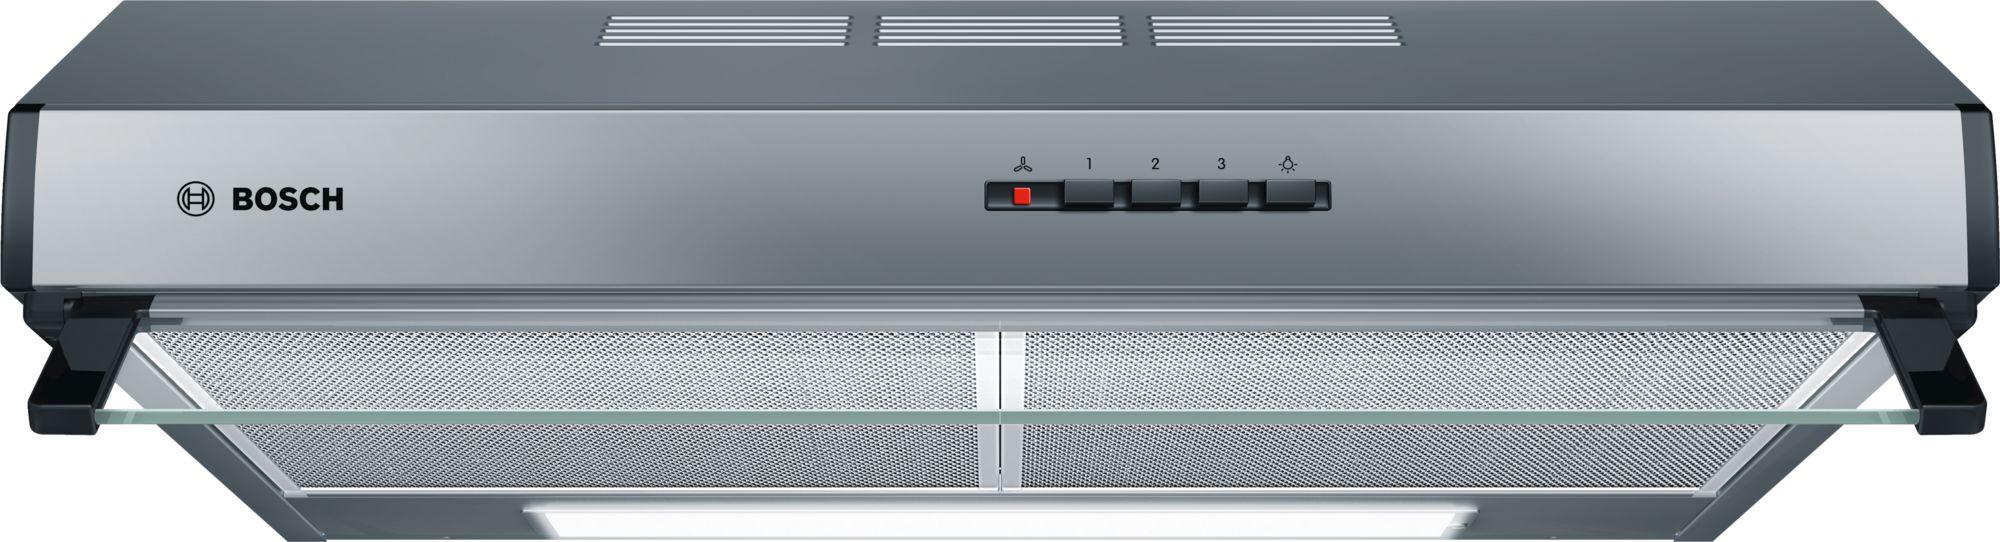 DUL63CC50